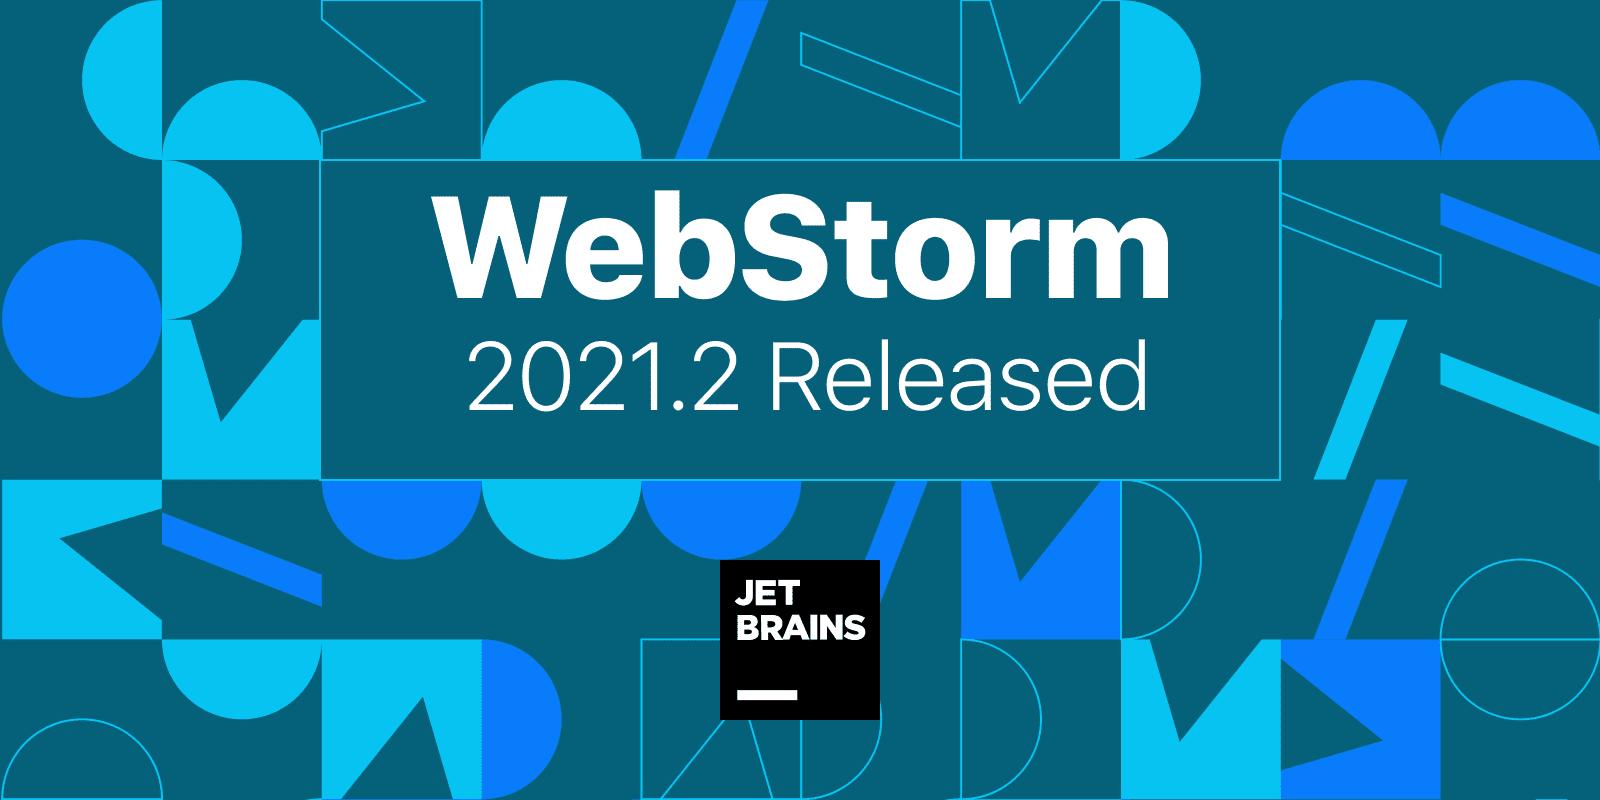 webstorm-2021-2-release-banner